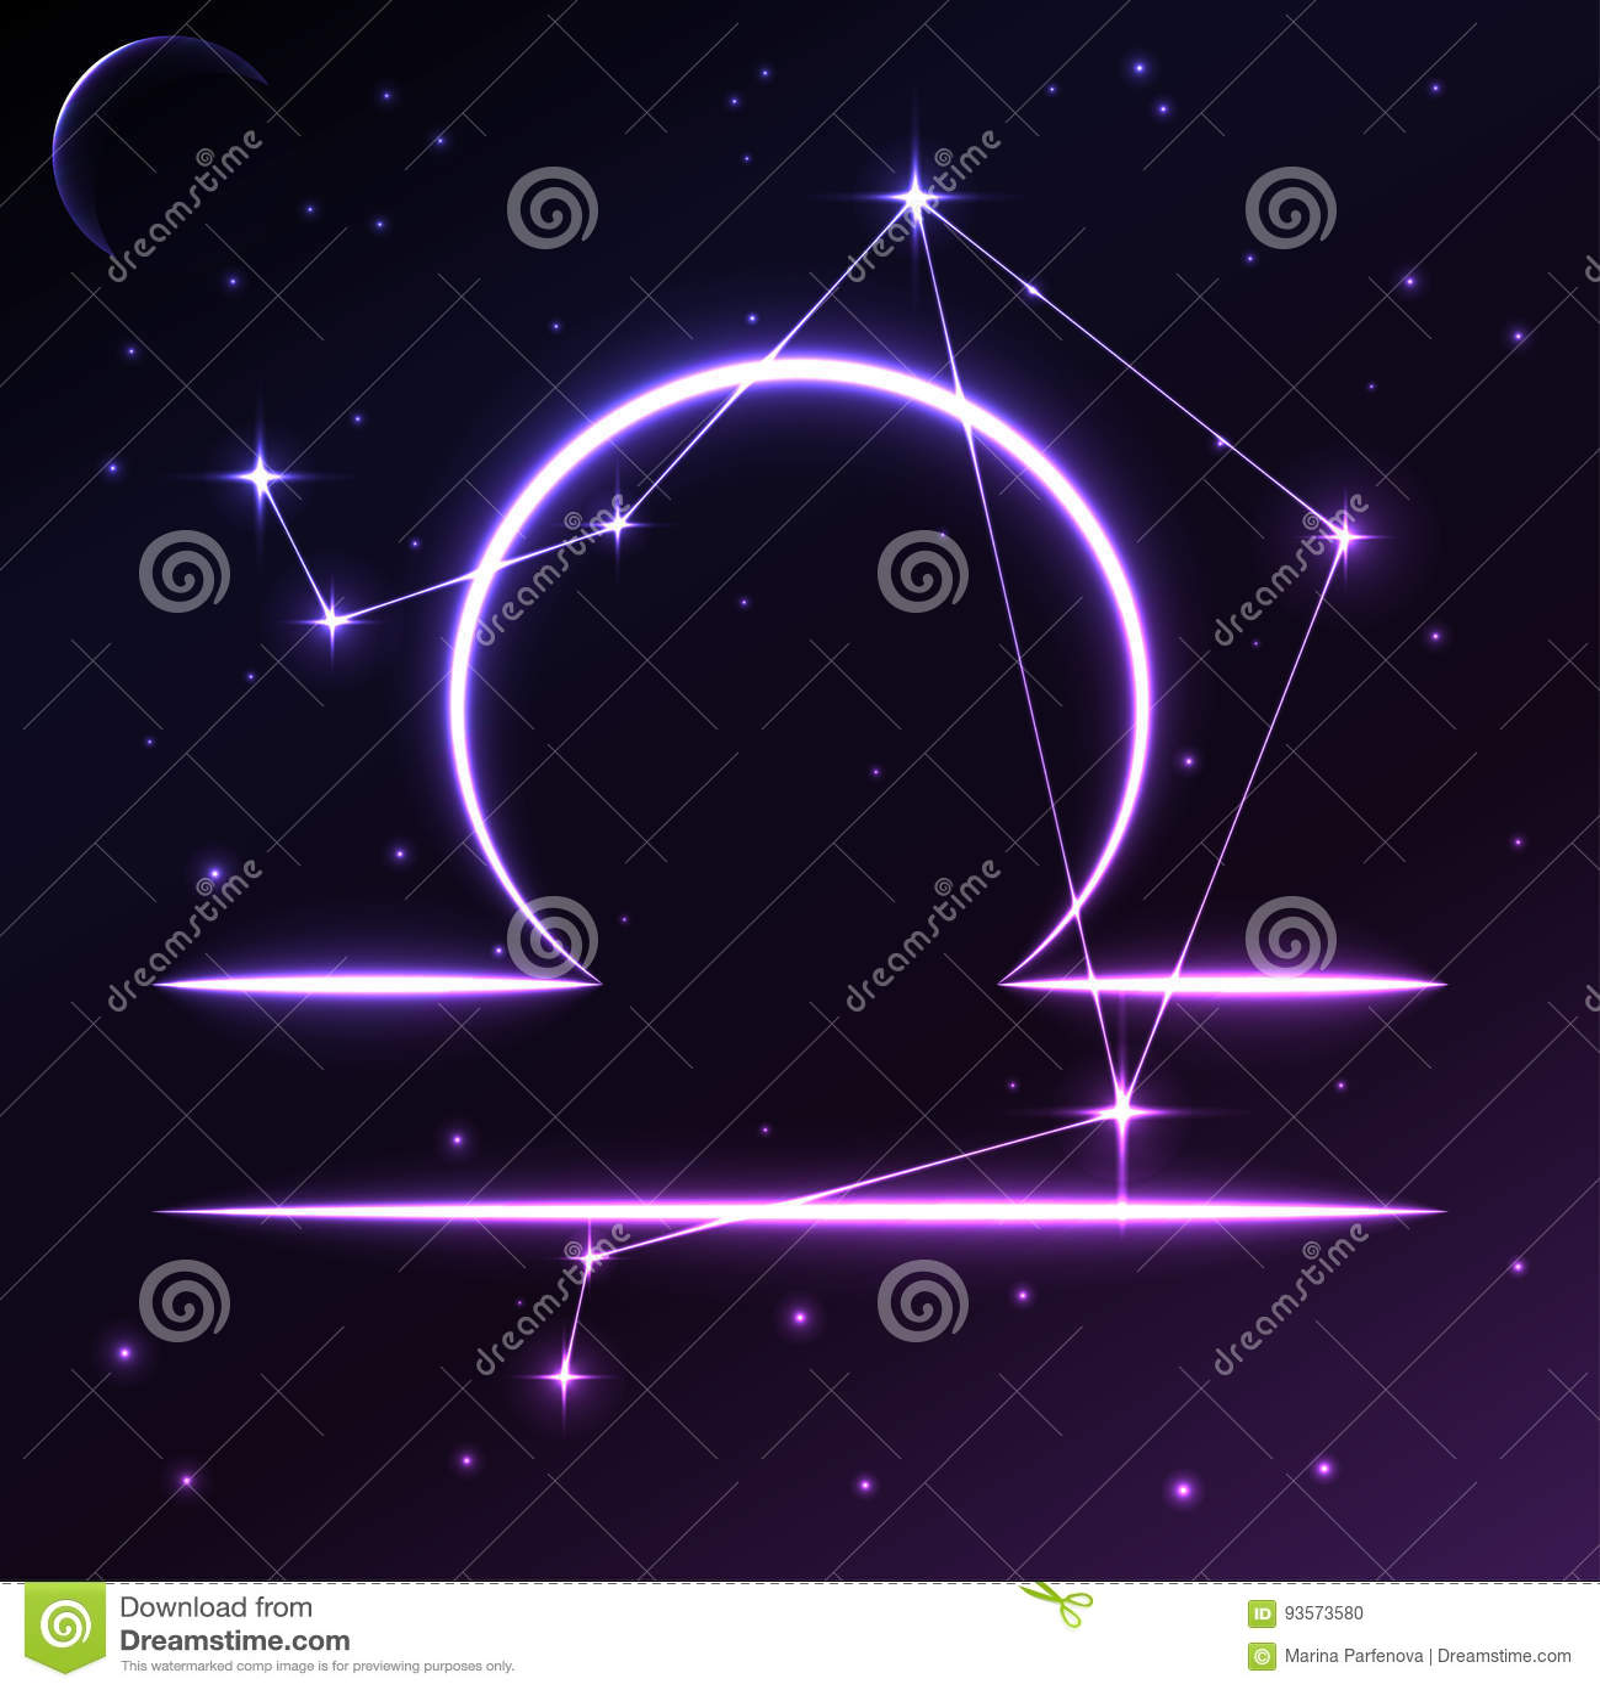 Space Symbol Of Libra Of Zodiac And Horoscope Concept Vector Art